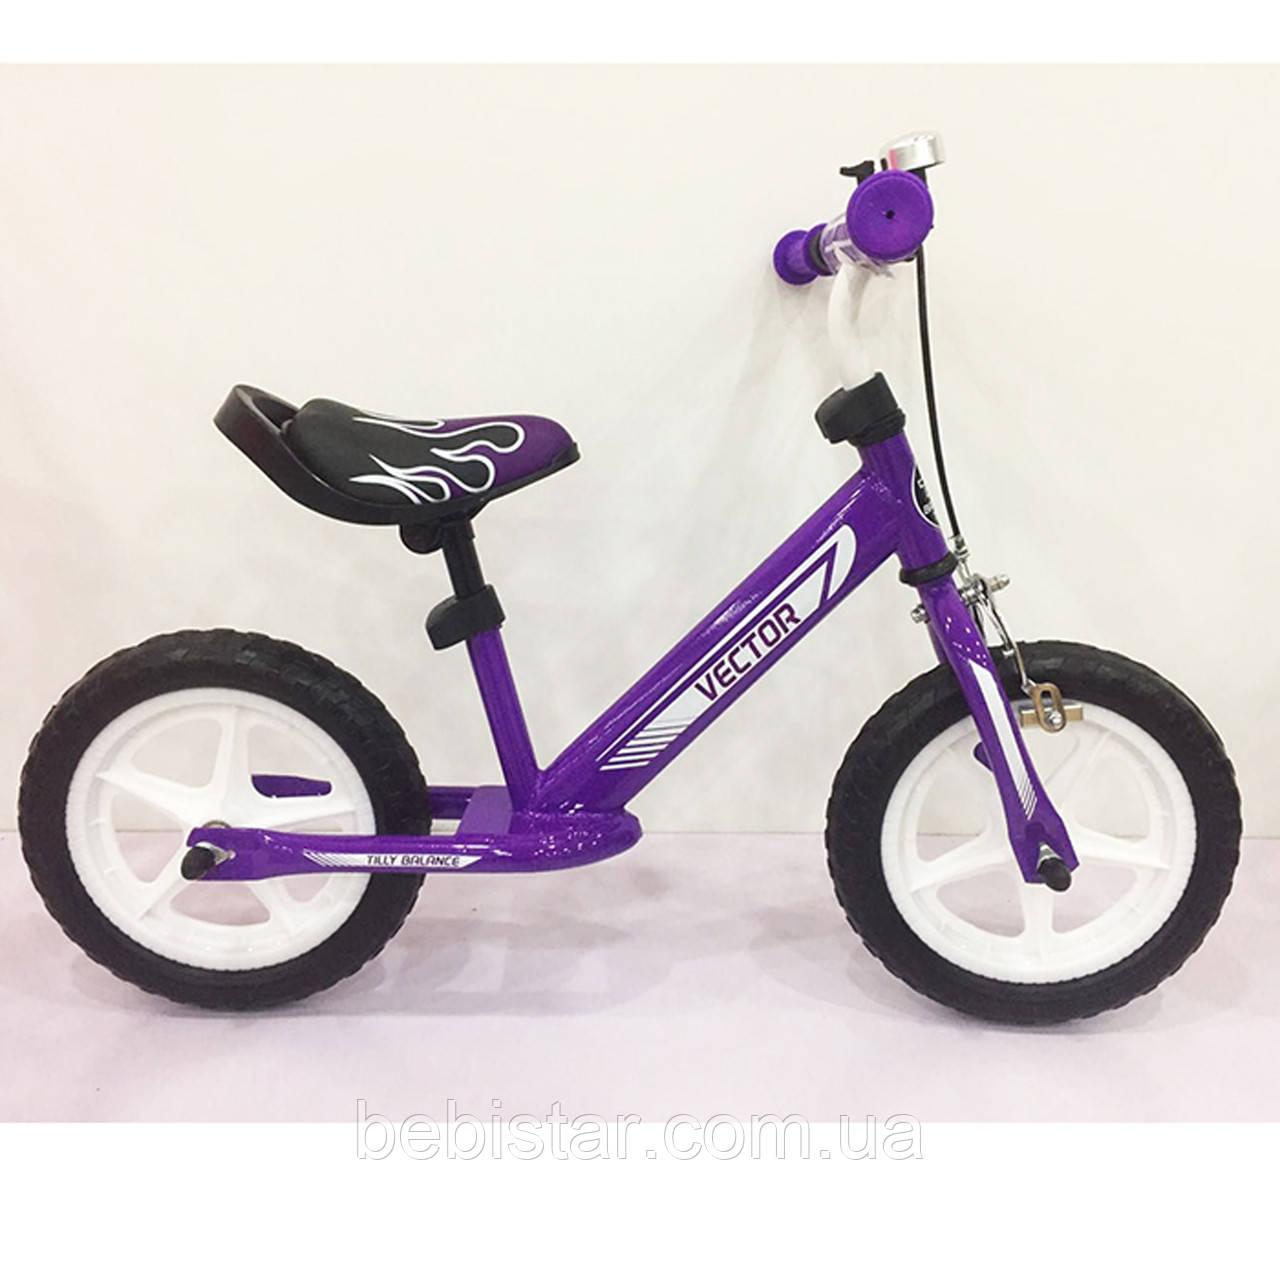 "Беговел  BALANCE TILLY 12"" Vector T-21256 Purple  для деток 2-5 лет"